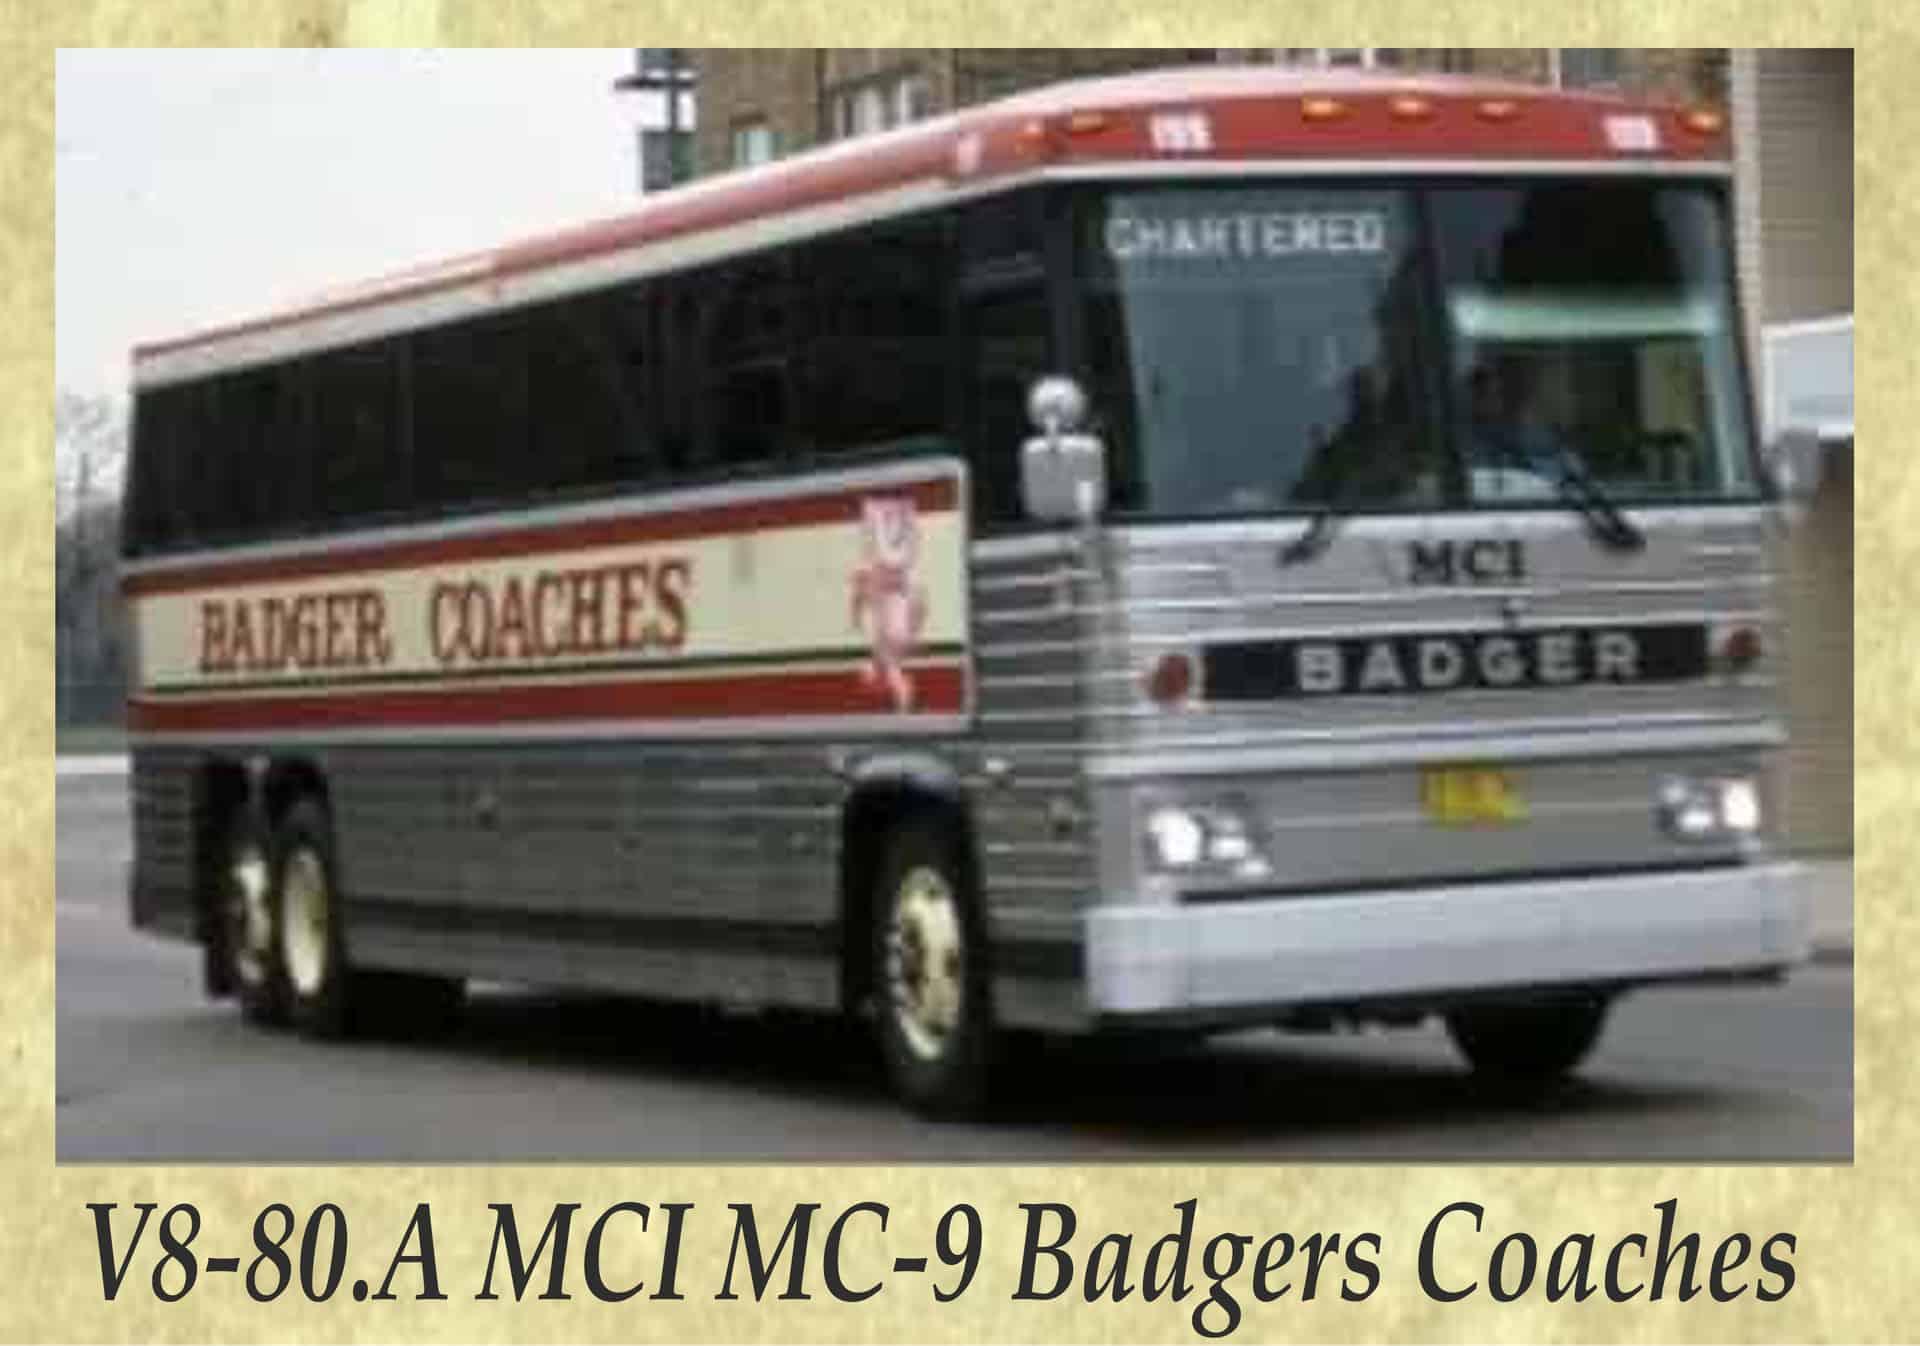 V8-80.A MCI MC-9 Badgers Coaches